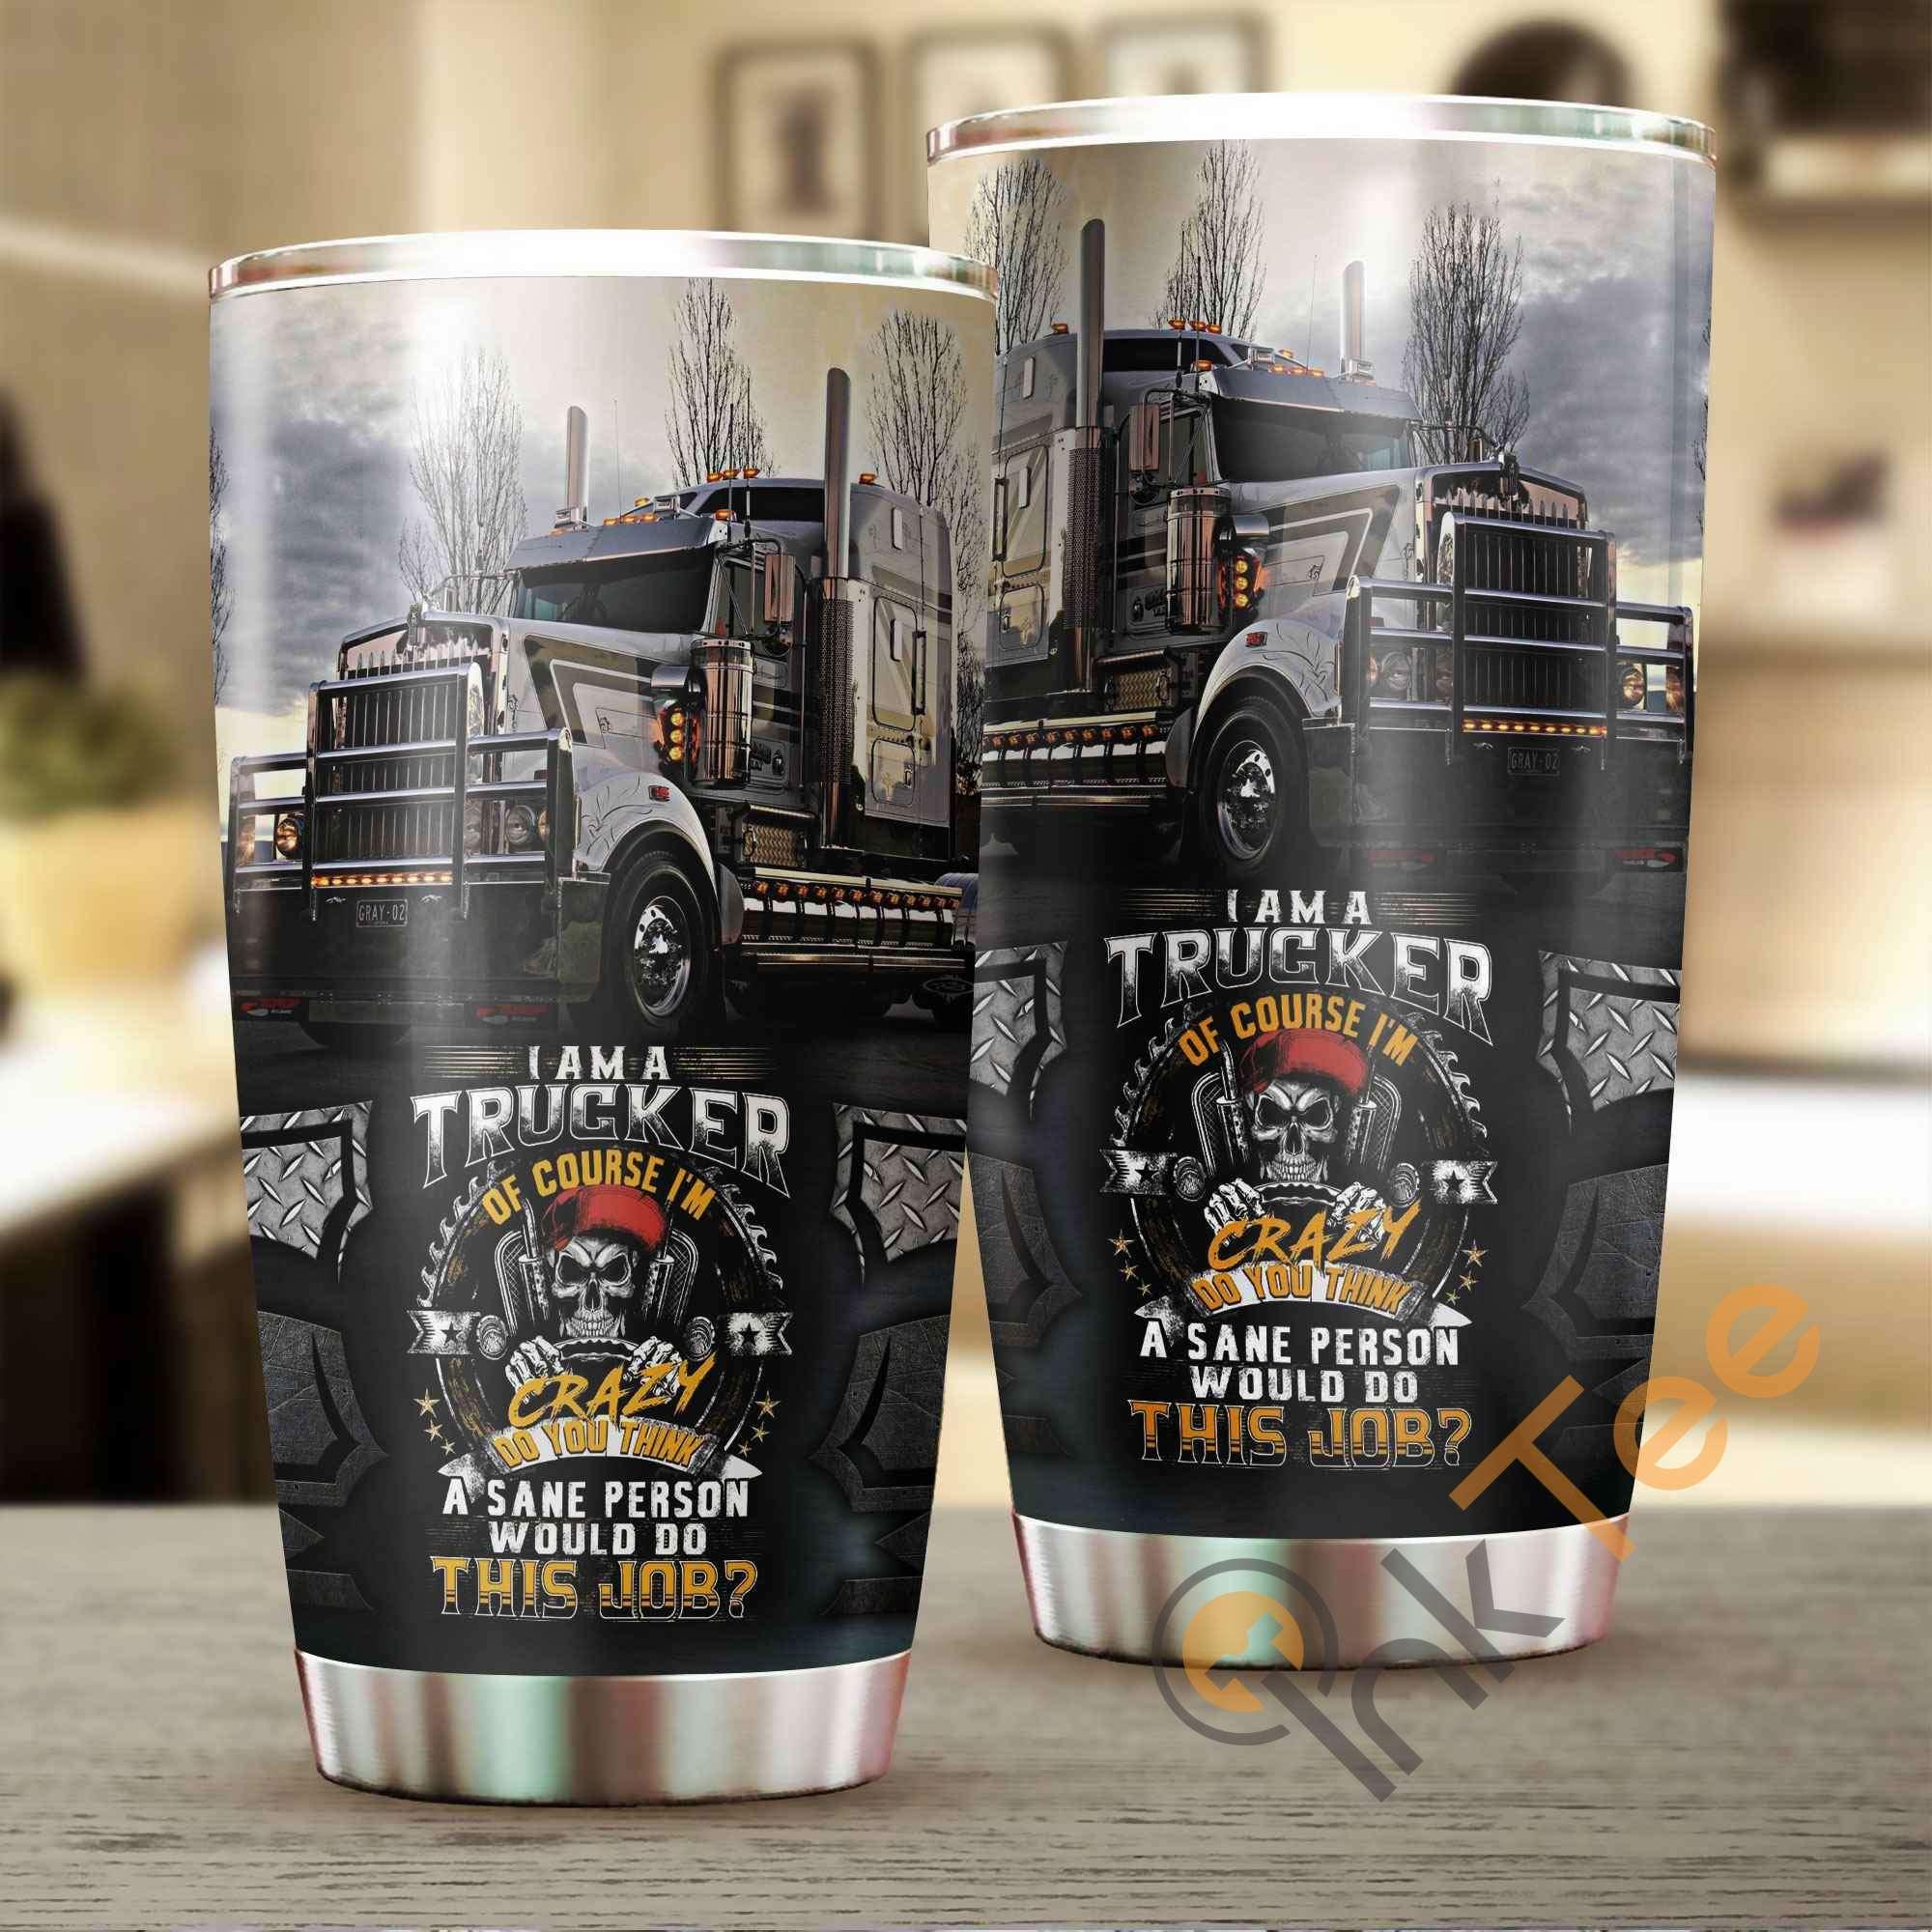 Beautiful Truck Amazon Best Seller Sku 3077 Stainless Steel Tumbler